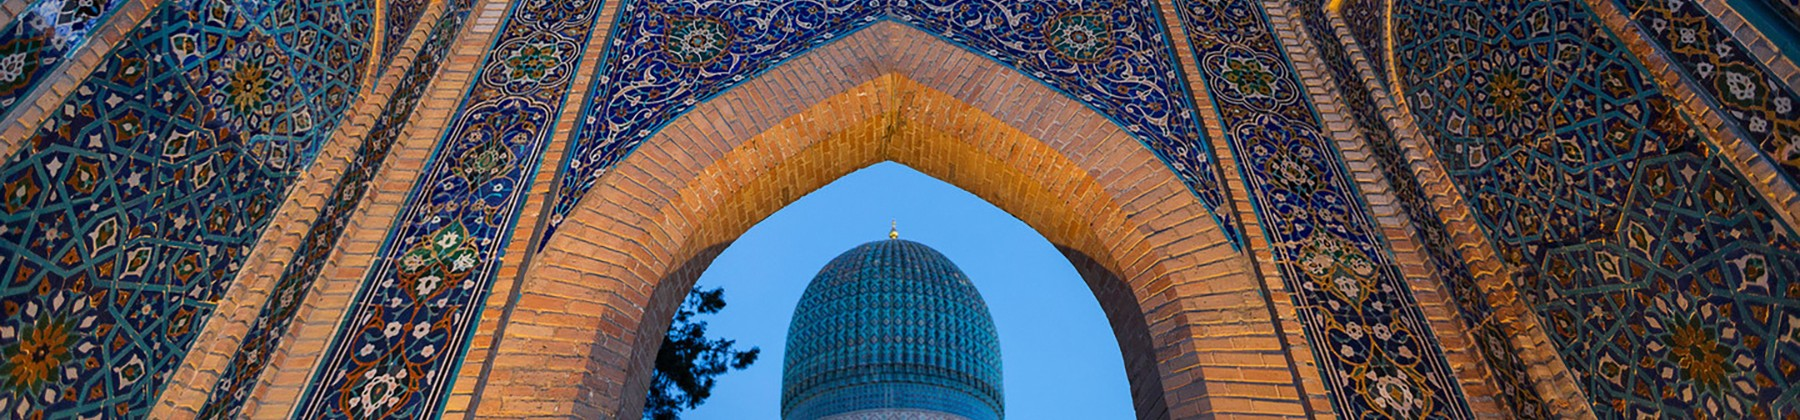 Traveling in Uzbekistan is more than 1000 kilometers long - 1